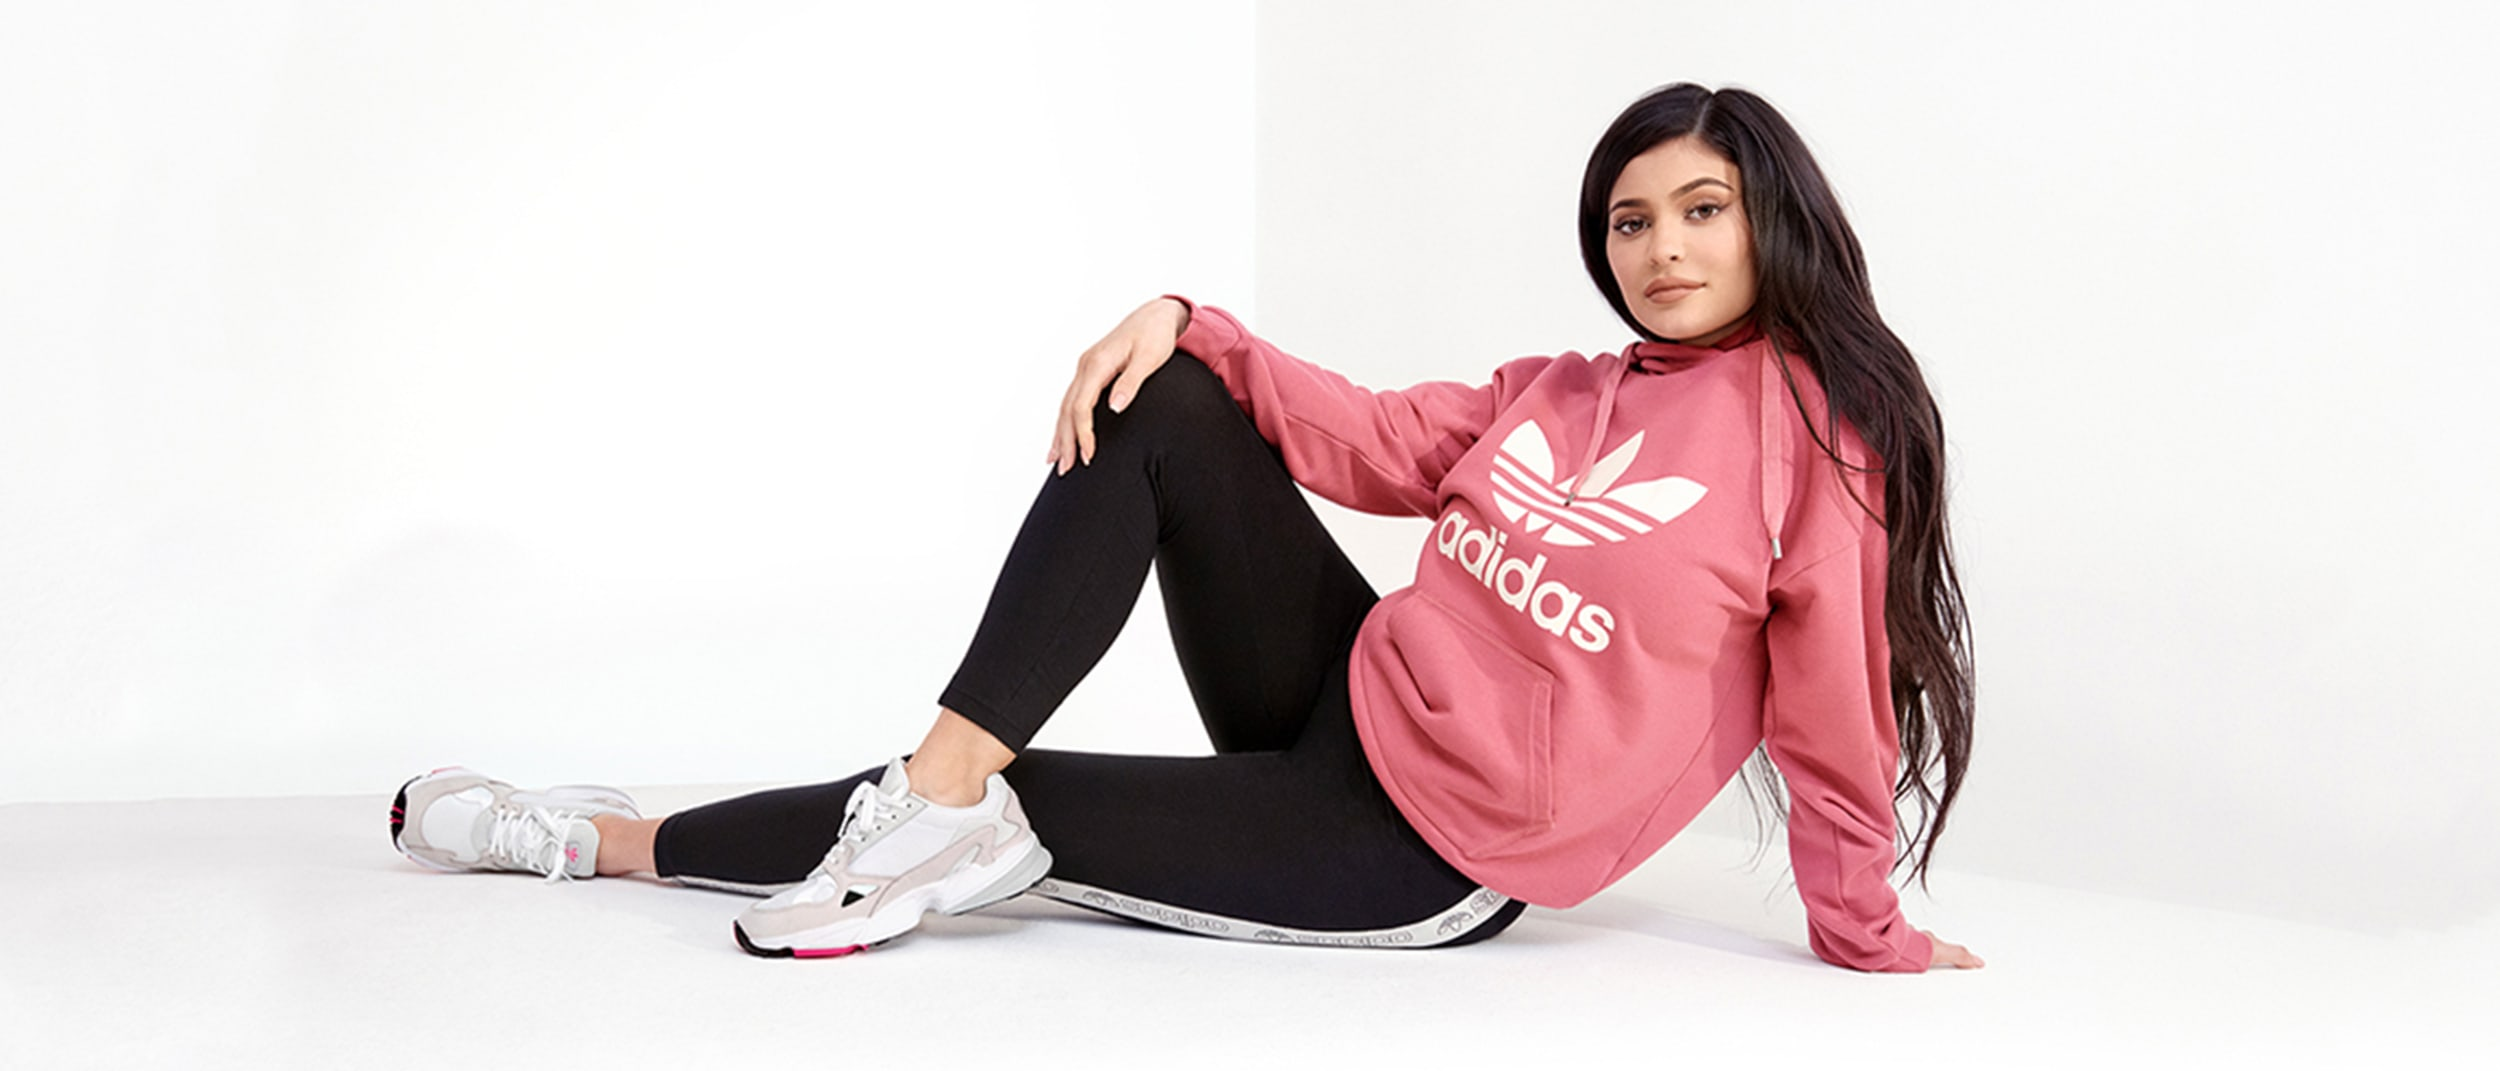 Kylie Jenner x adidas Originals for JD Sports